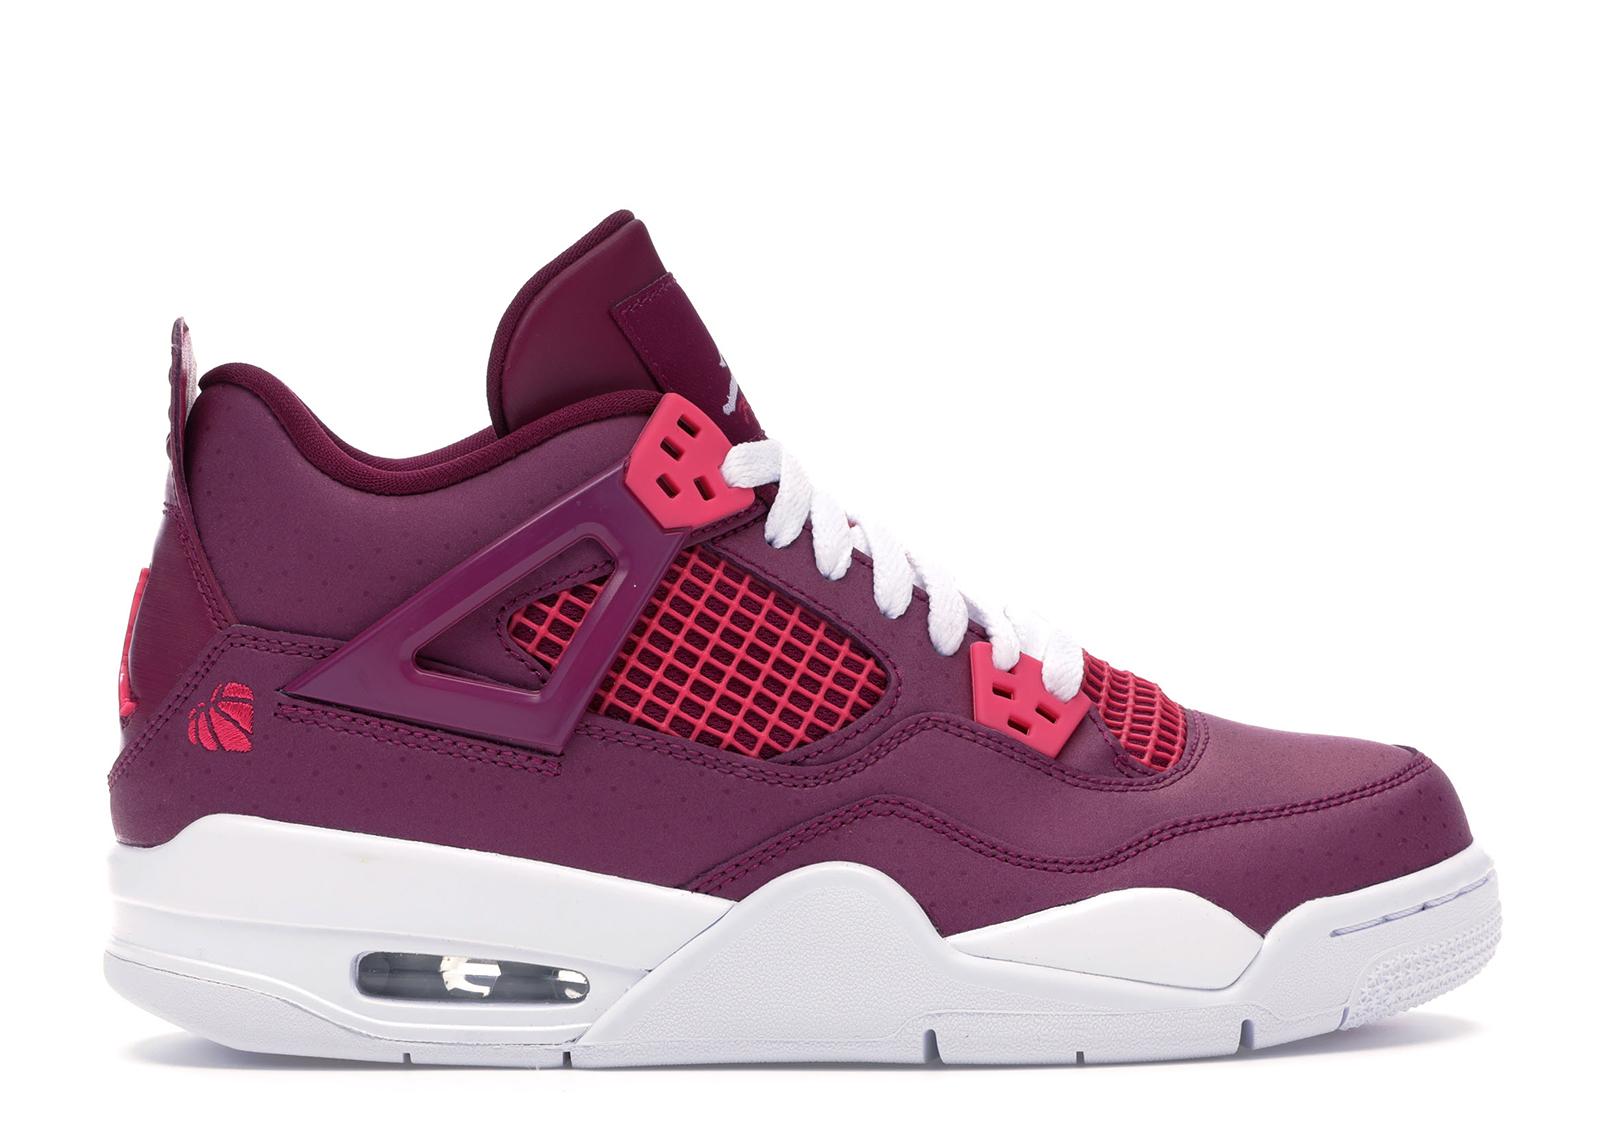 Jordan 4 Retro Valentine's Day 2019 (GS)